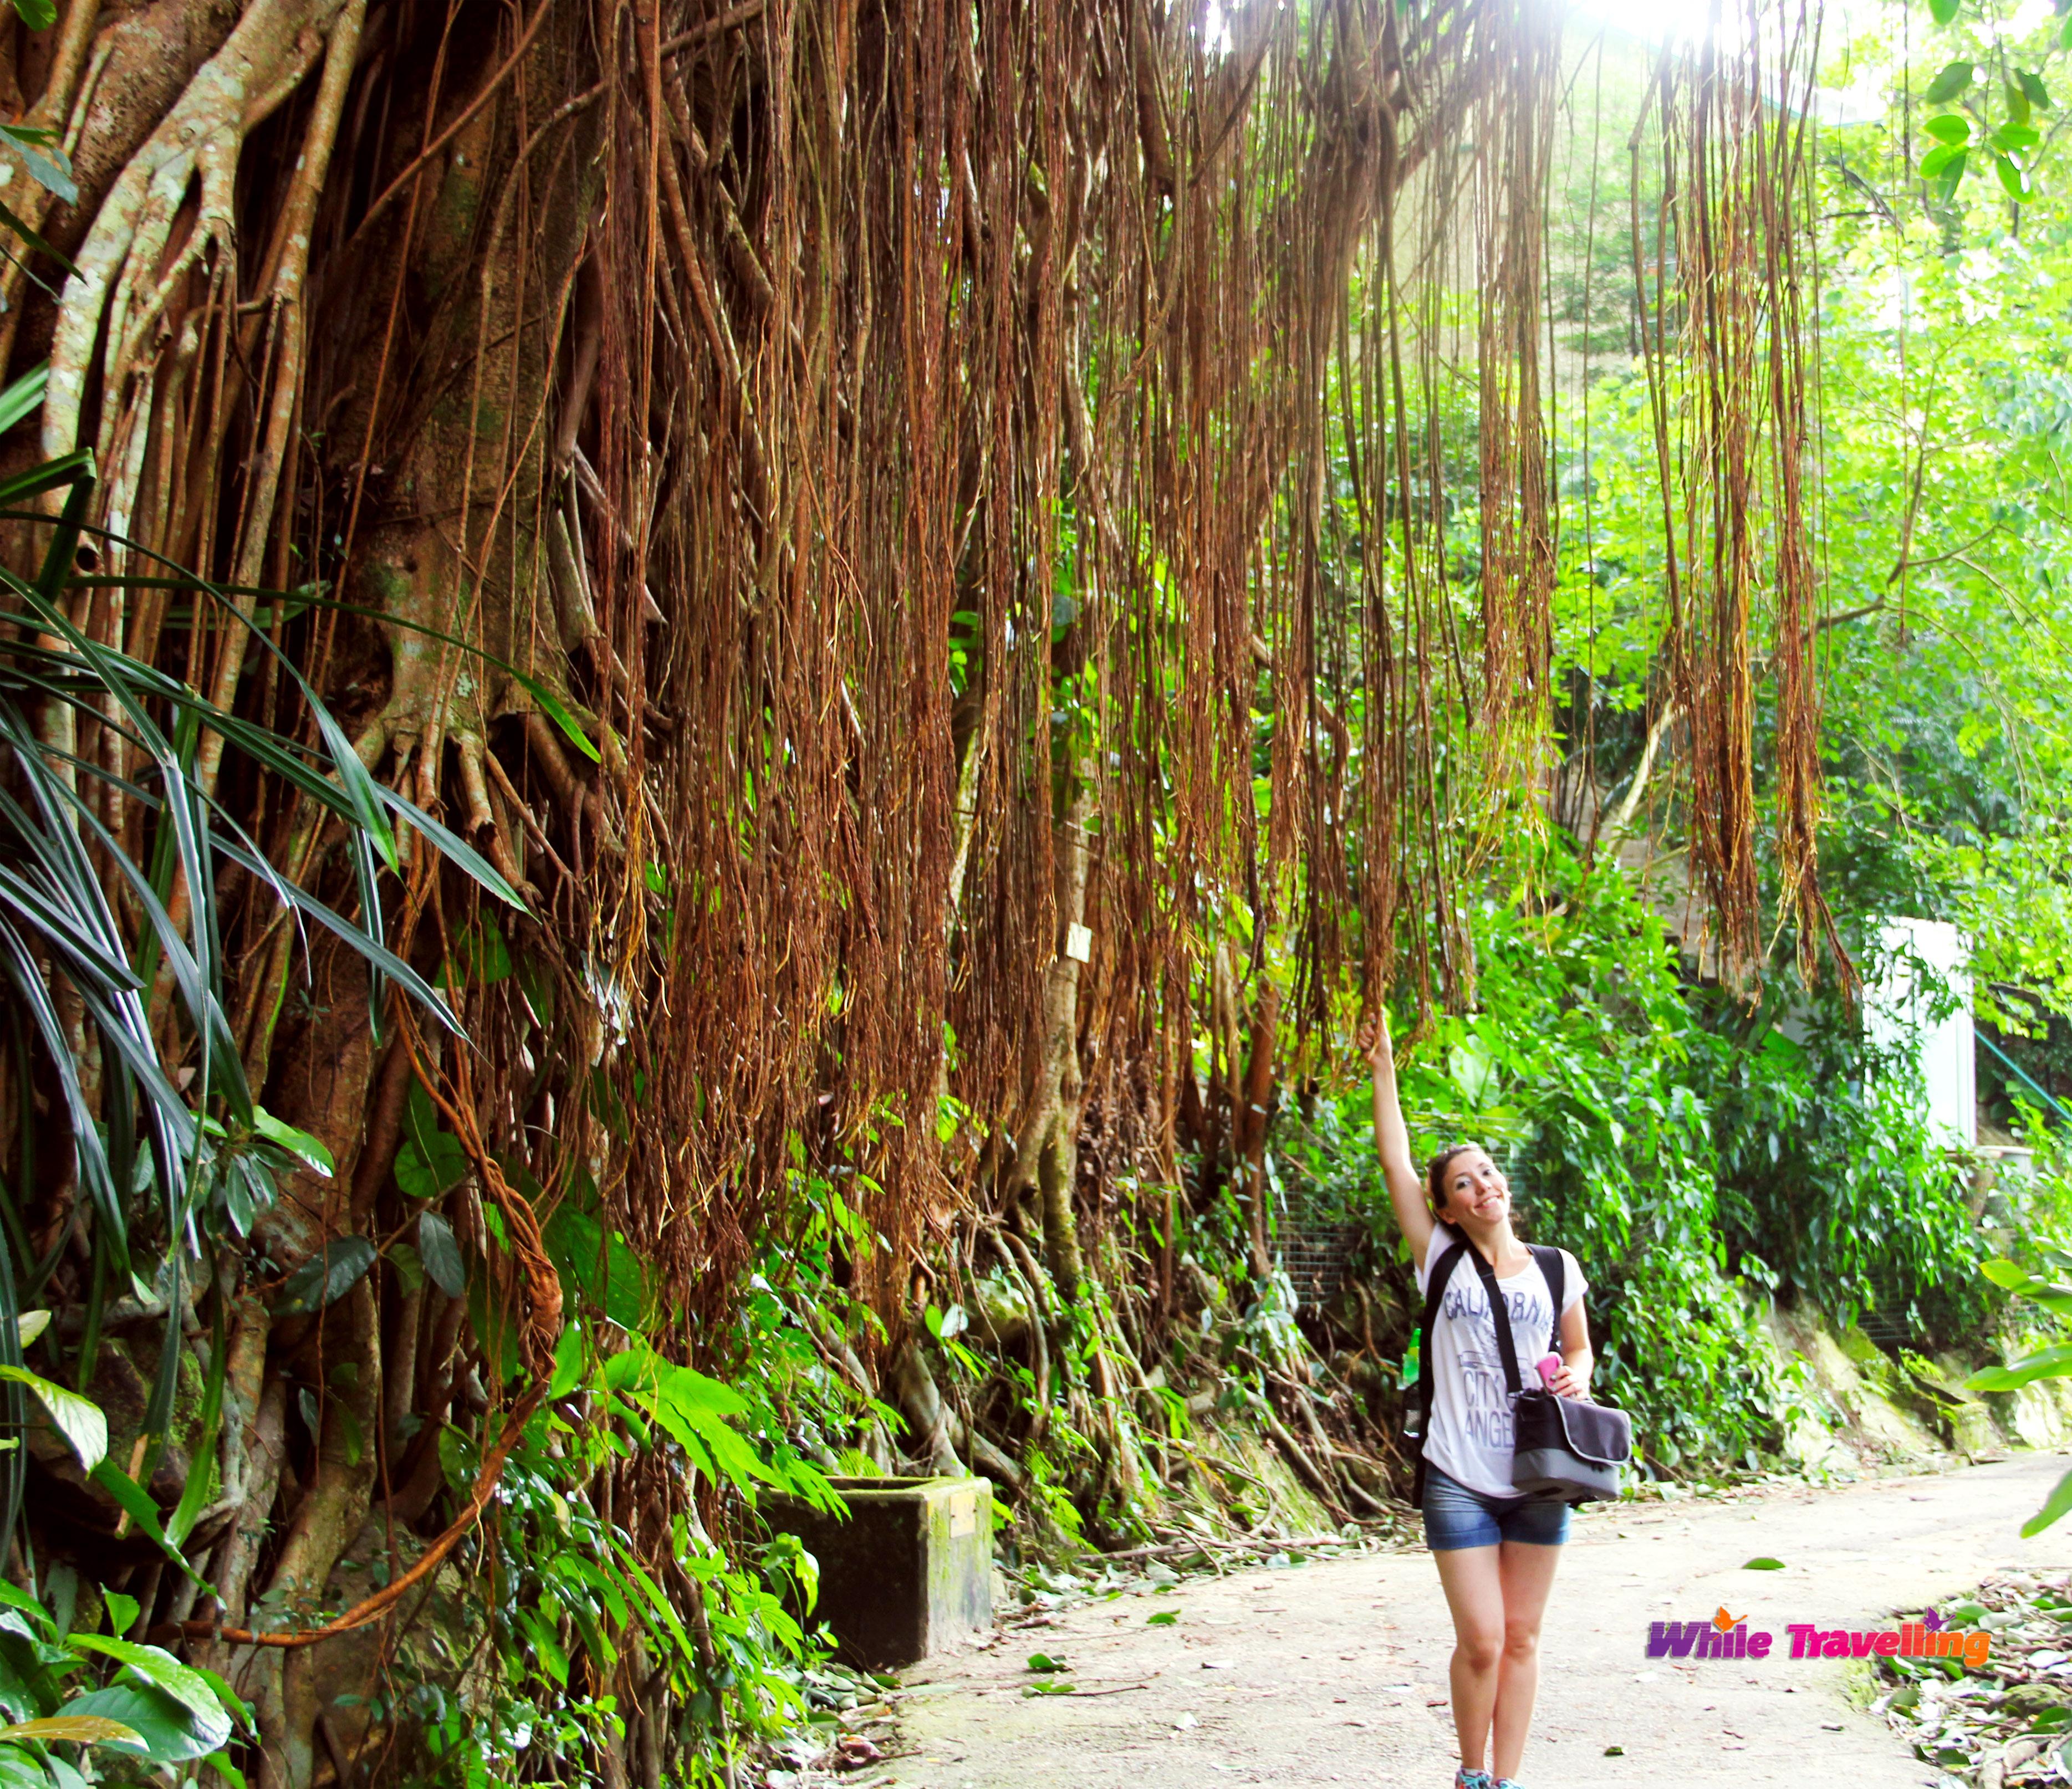 Amazing Hong Kong: Hiking In Amazing Victoria Trail(The Peak Trail) In Hong